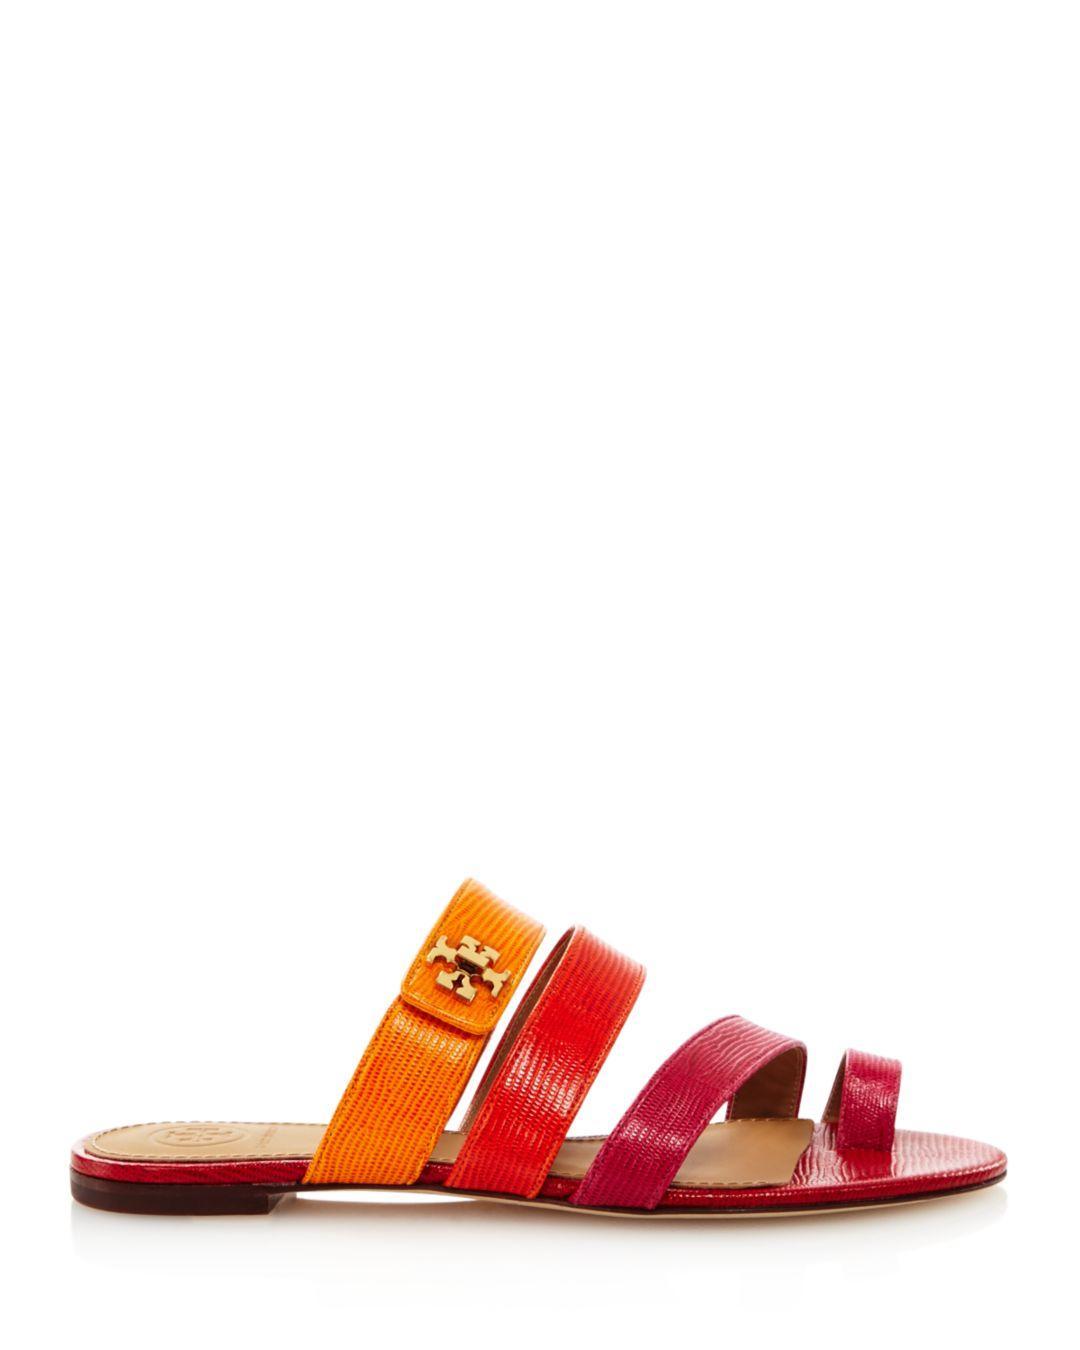 dd5de801f0864 Lyst - Tory Burch Kira Toe Ring Sandal